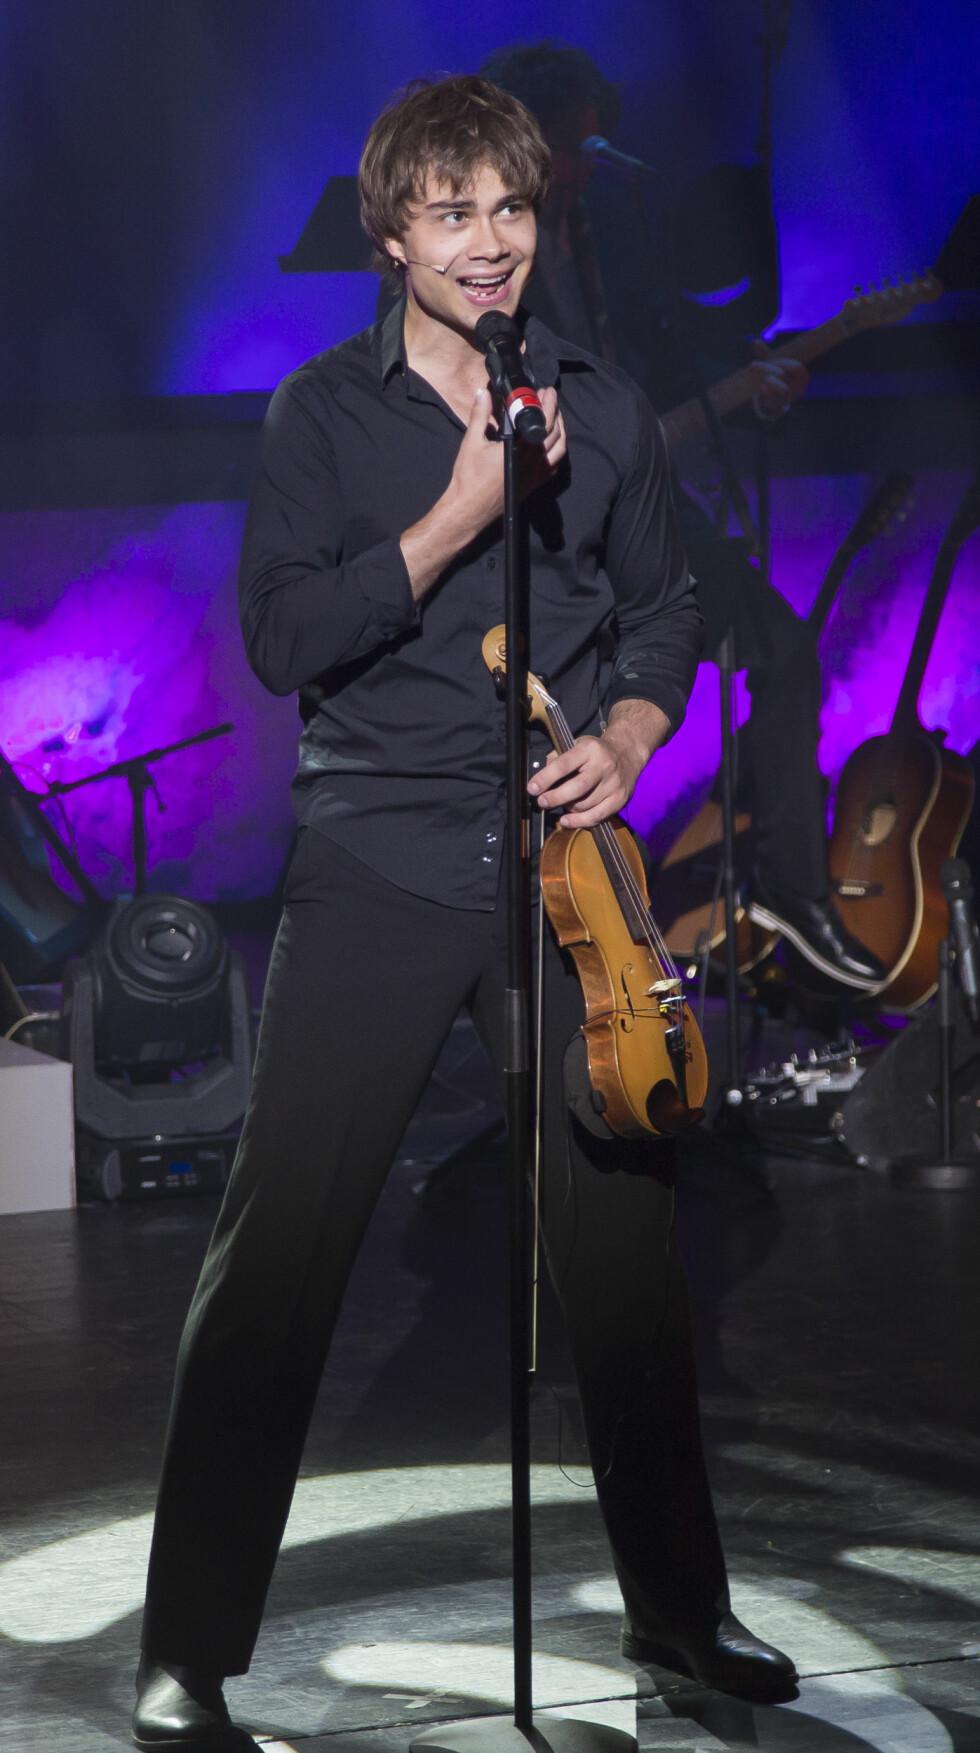 ELEKTRISK STEMNING: Alexander Rybak måtte improvisere da lynet slo ned i kulturhuset i Larvik under showet «Entertainer». Foto: Tore Skaar, Se og Hør